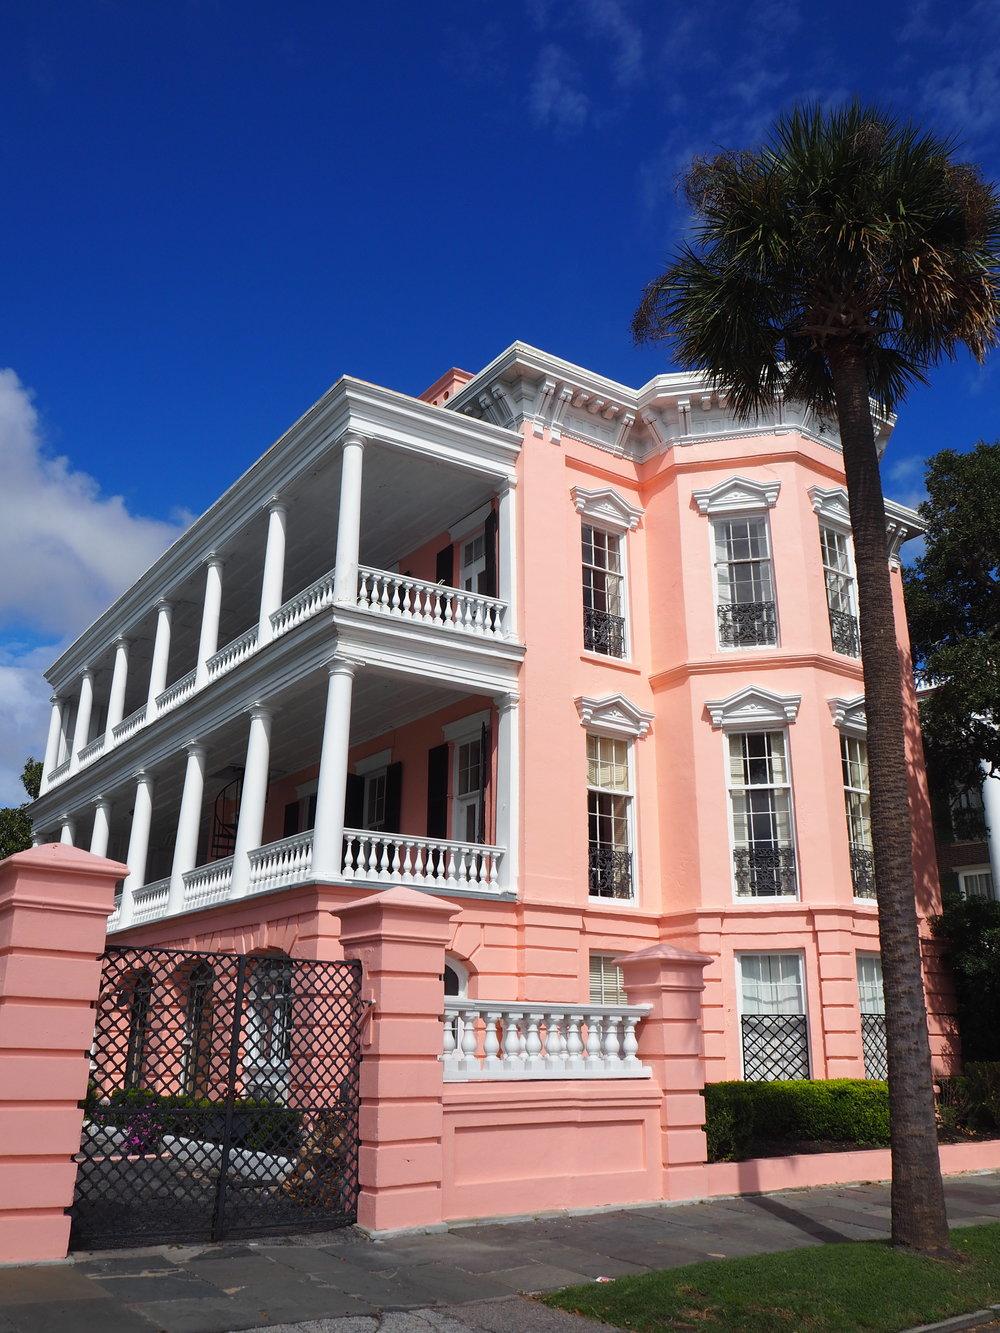 Rainbow row- Charleston, South Carolina.